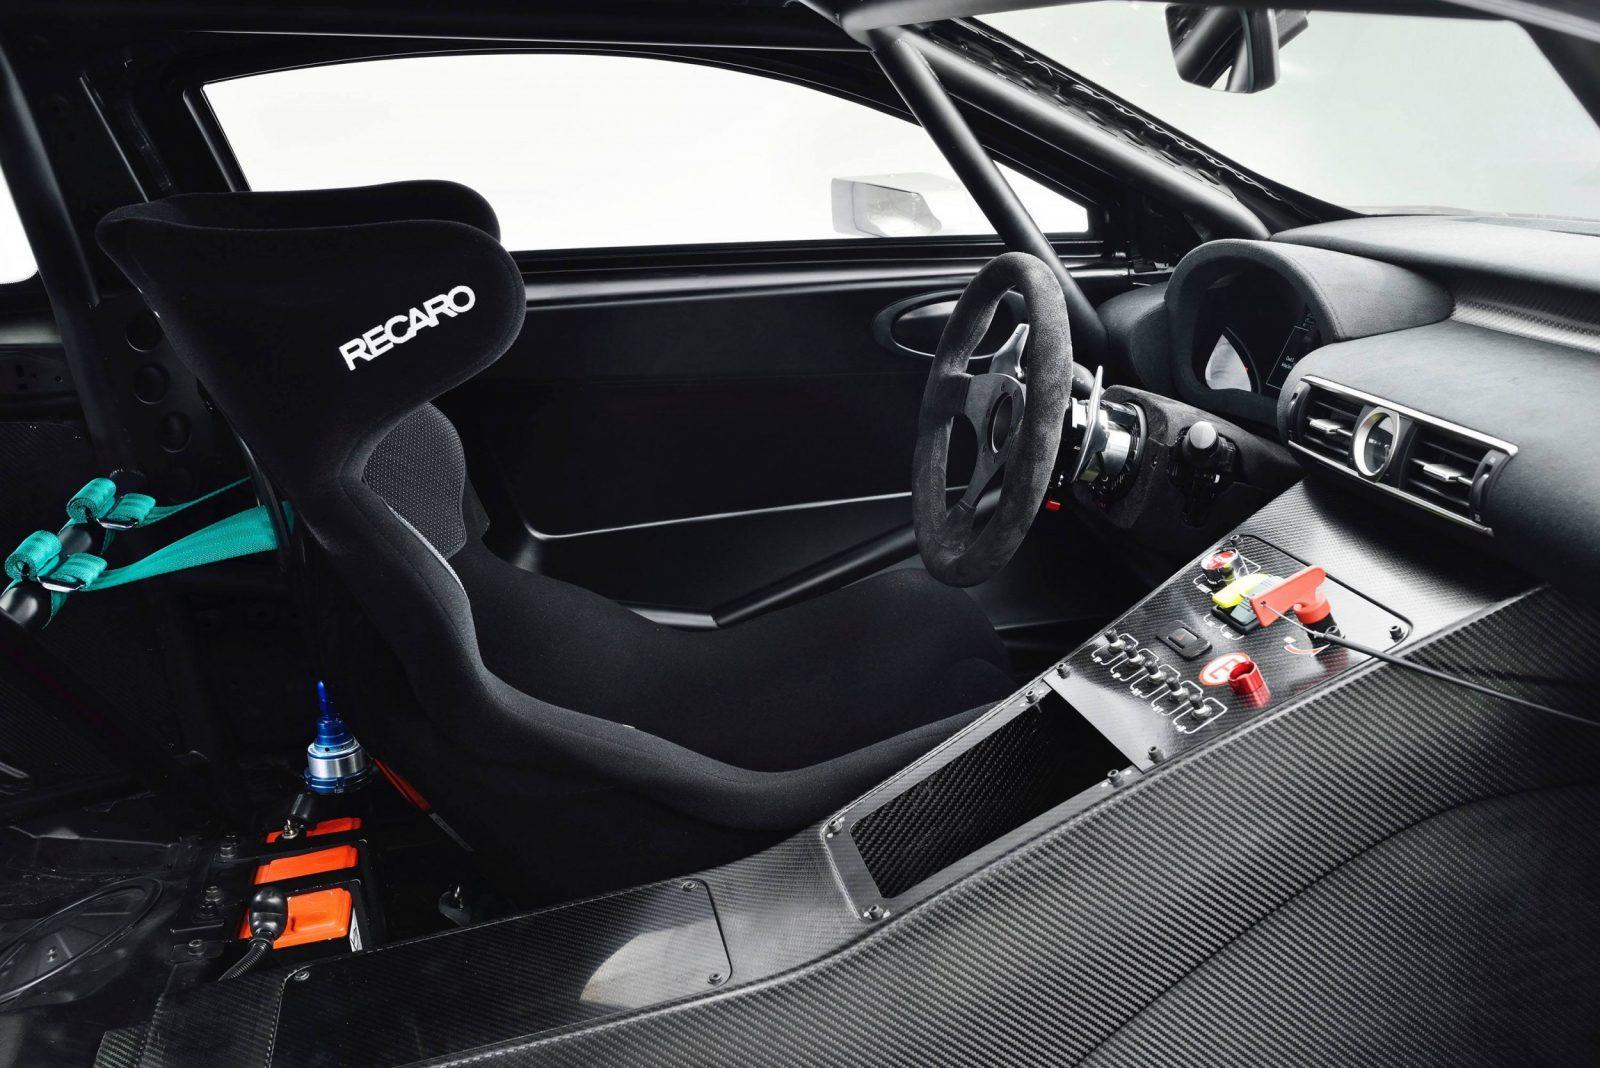 Lexus_RC_F_GT3_Concept_013